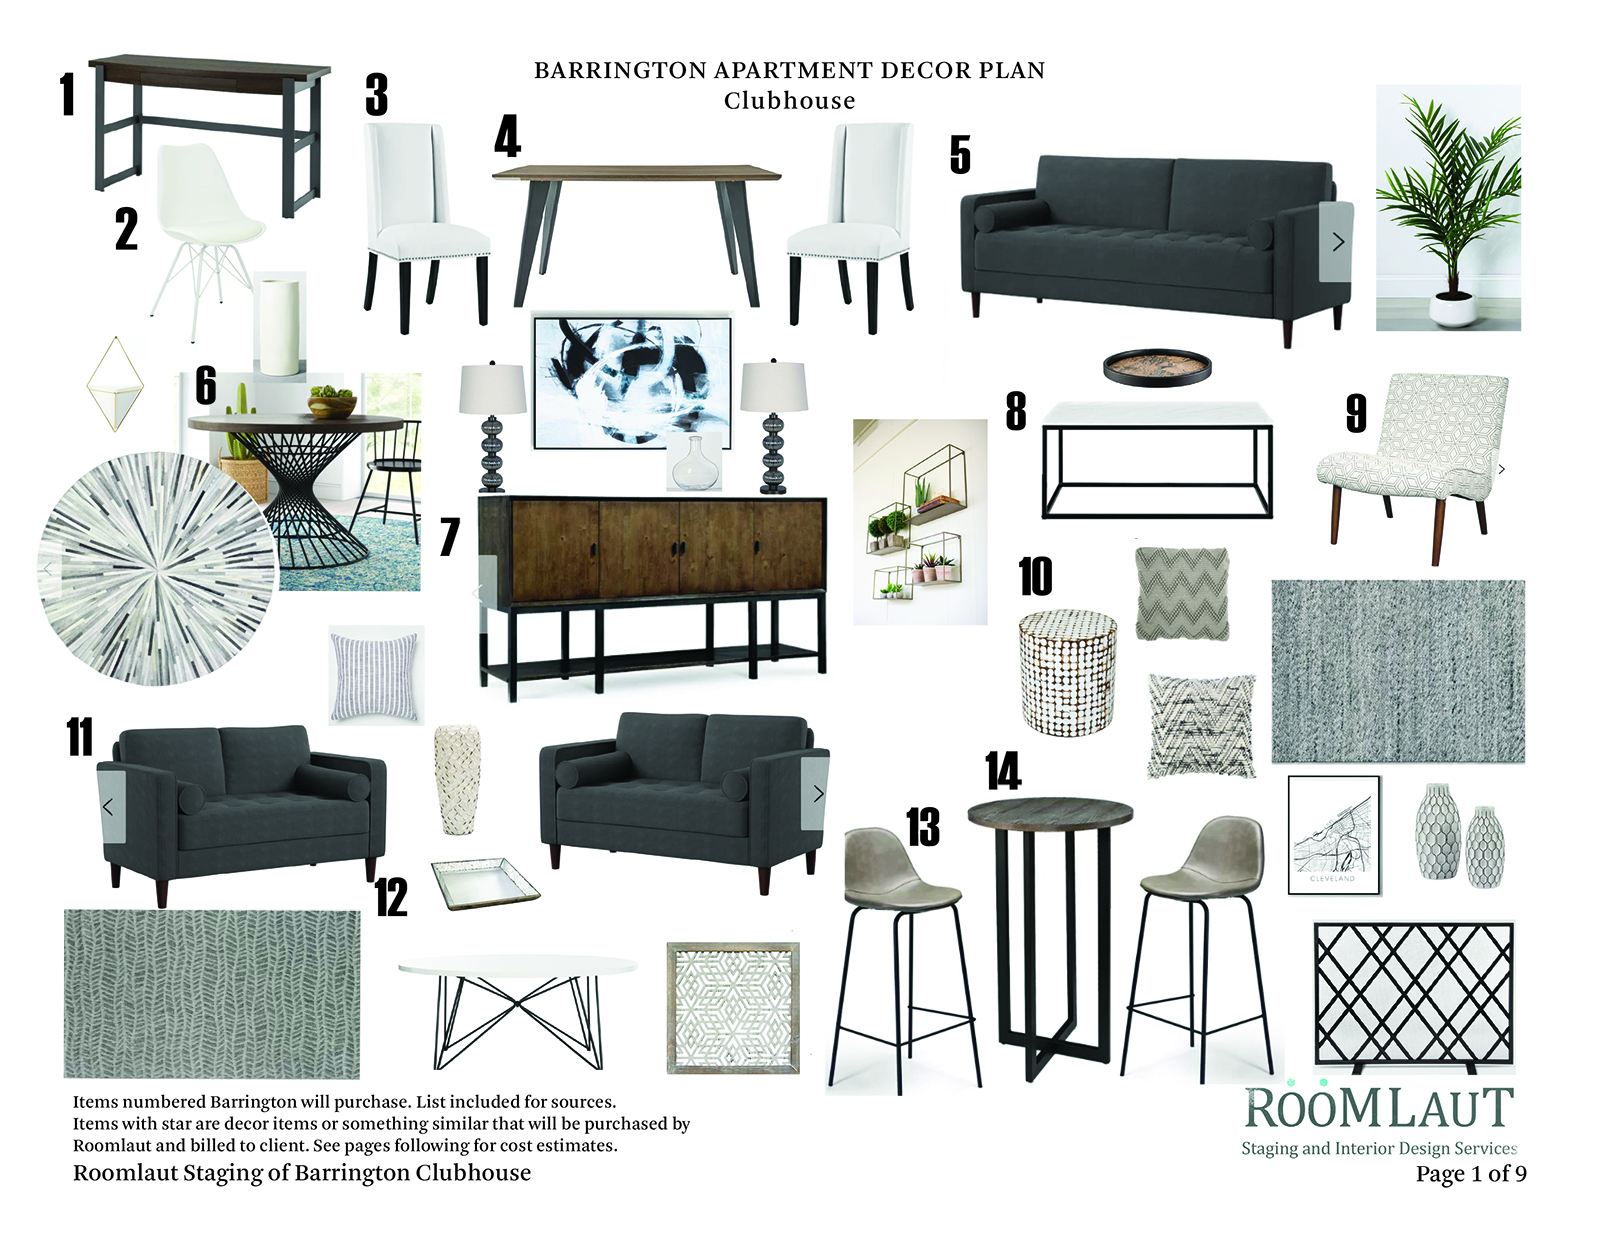 Roomlaut_Barrington clubhouse